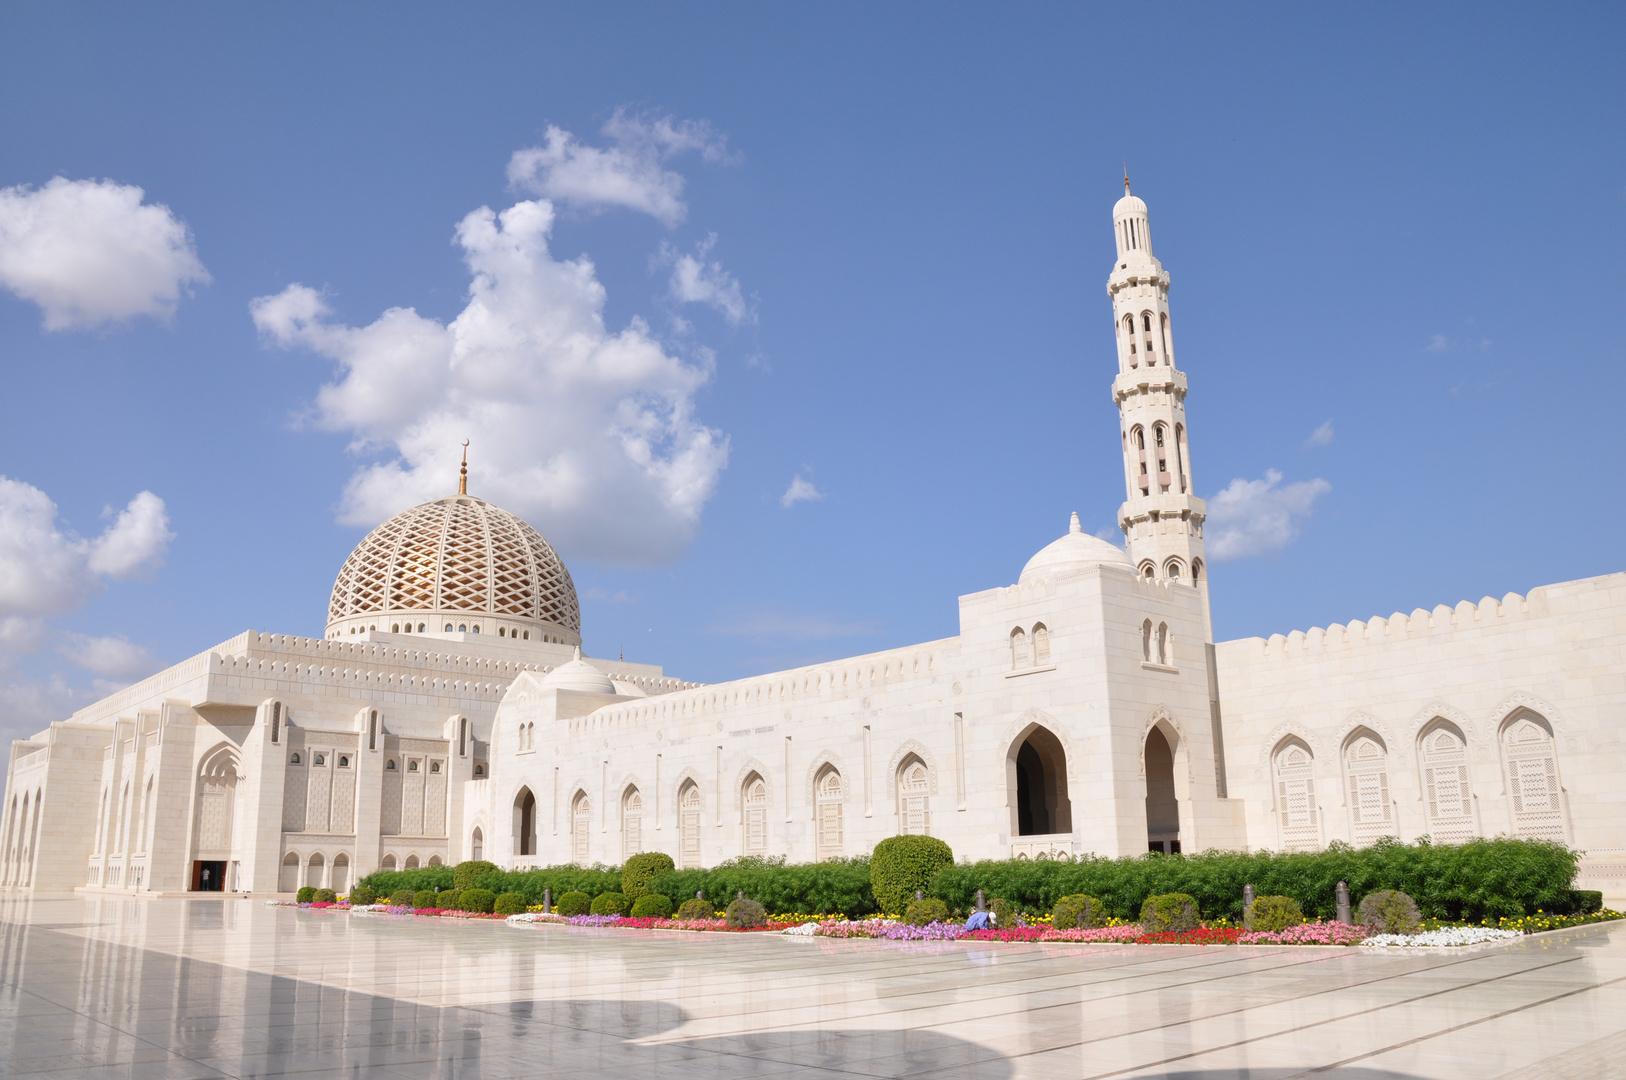 Sultan Qaboos Mosque II